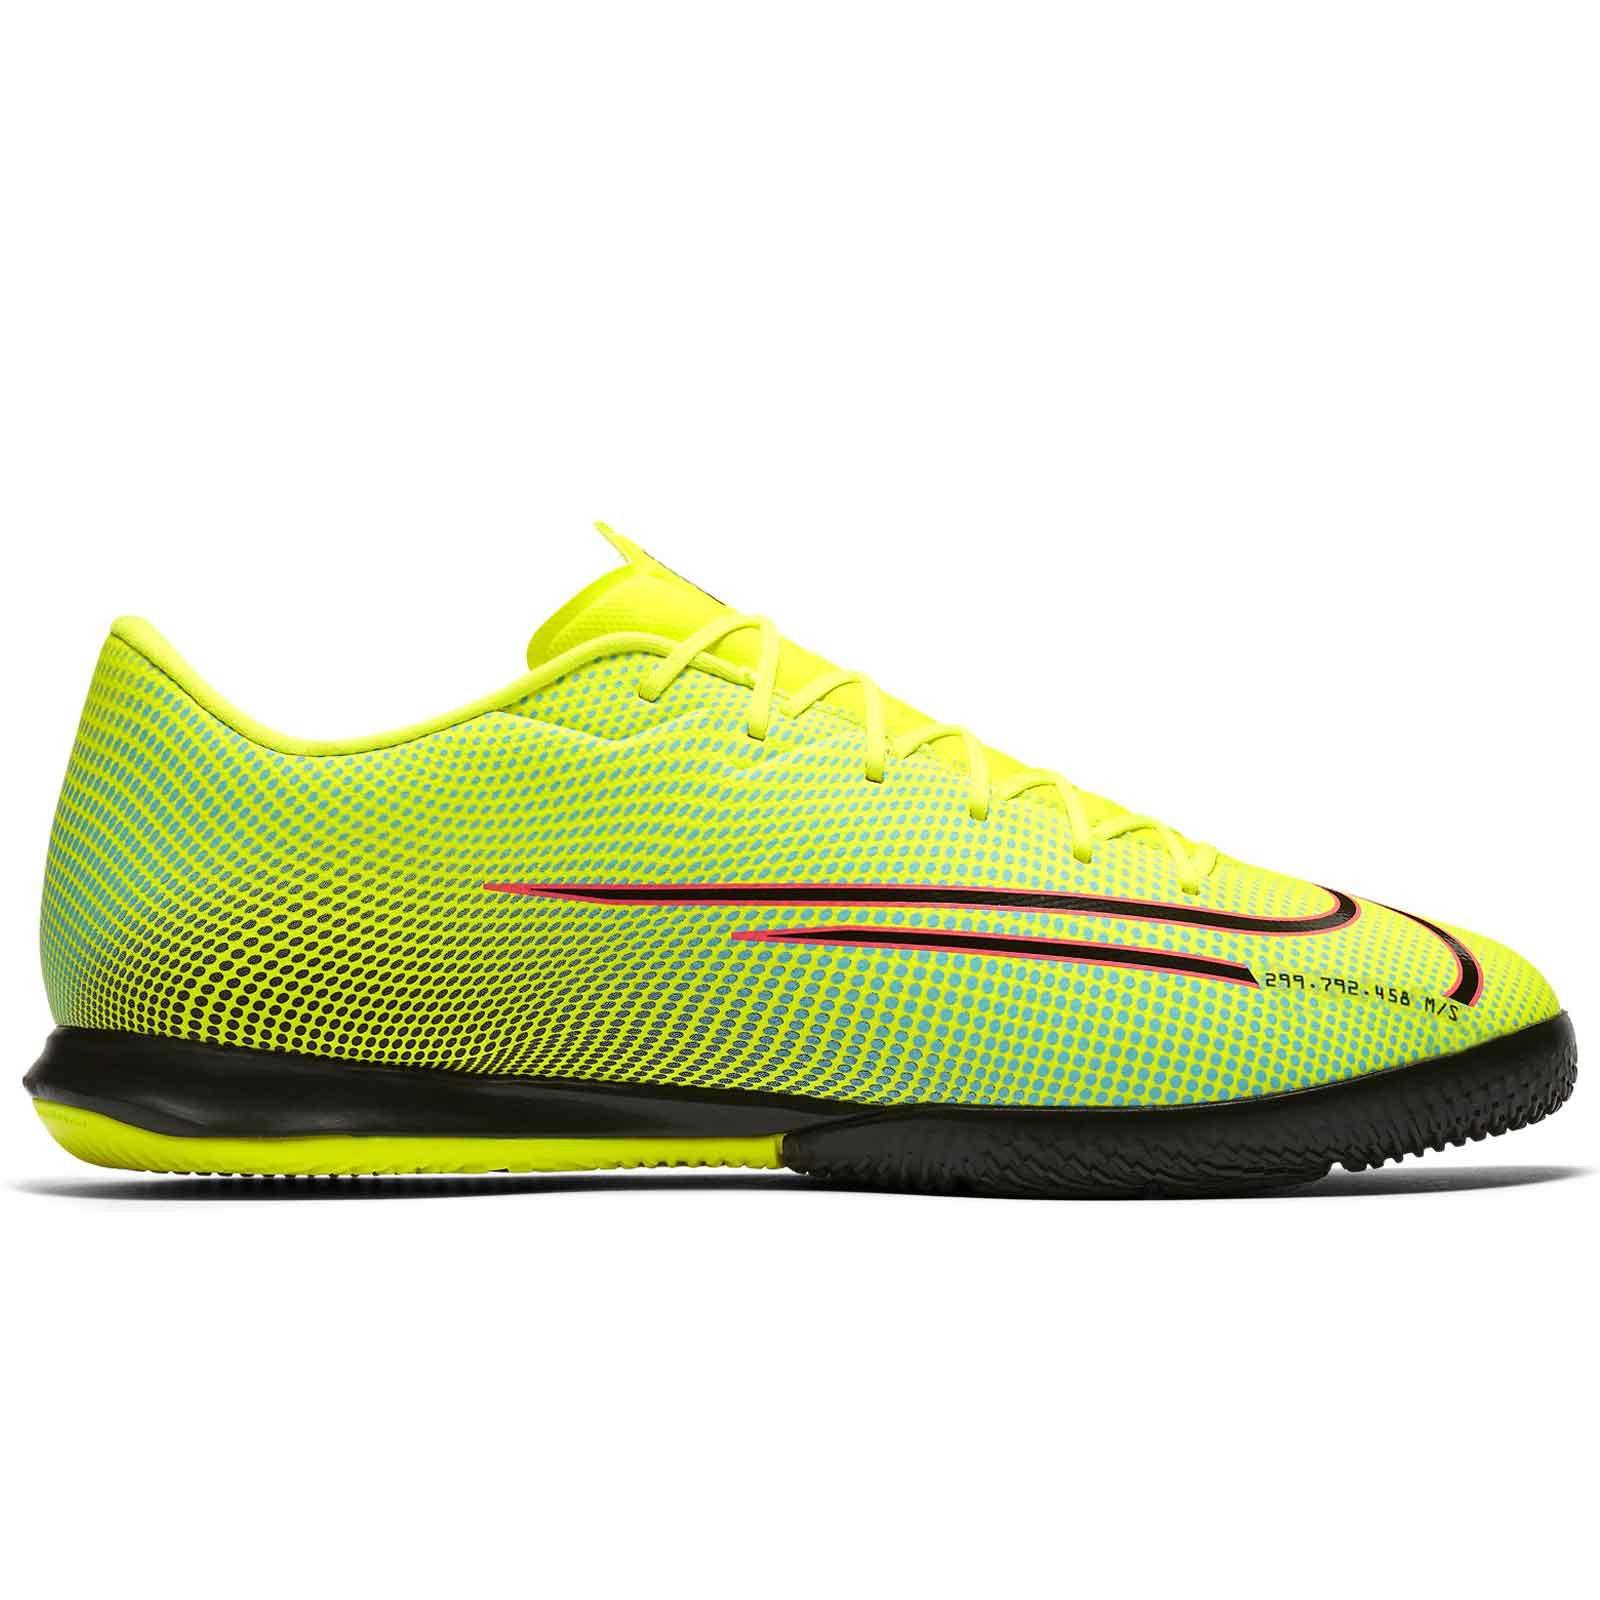 Nike Mercurial Vapor 13 Academy MDS IC CJ1300 703